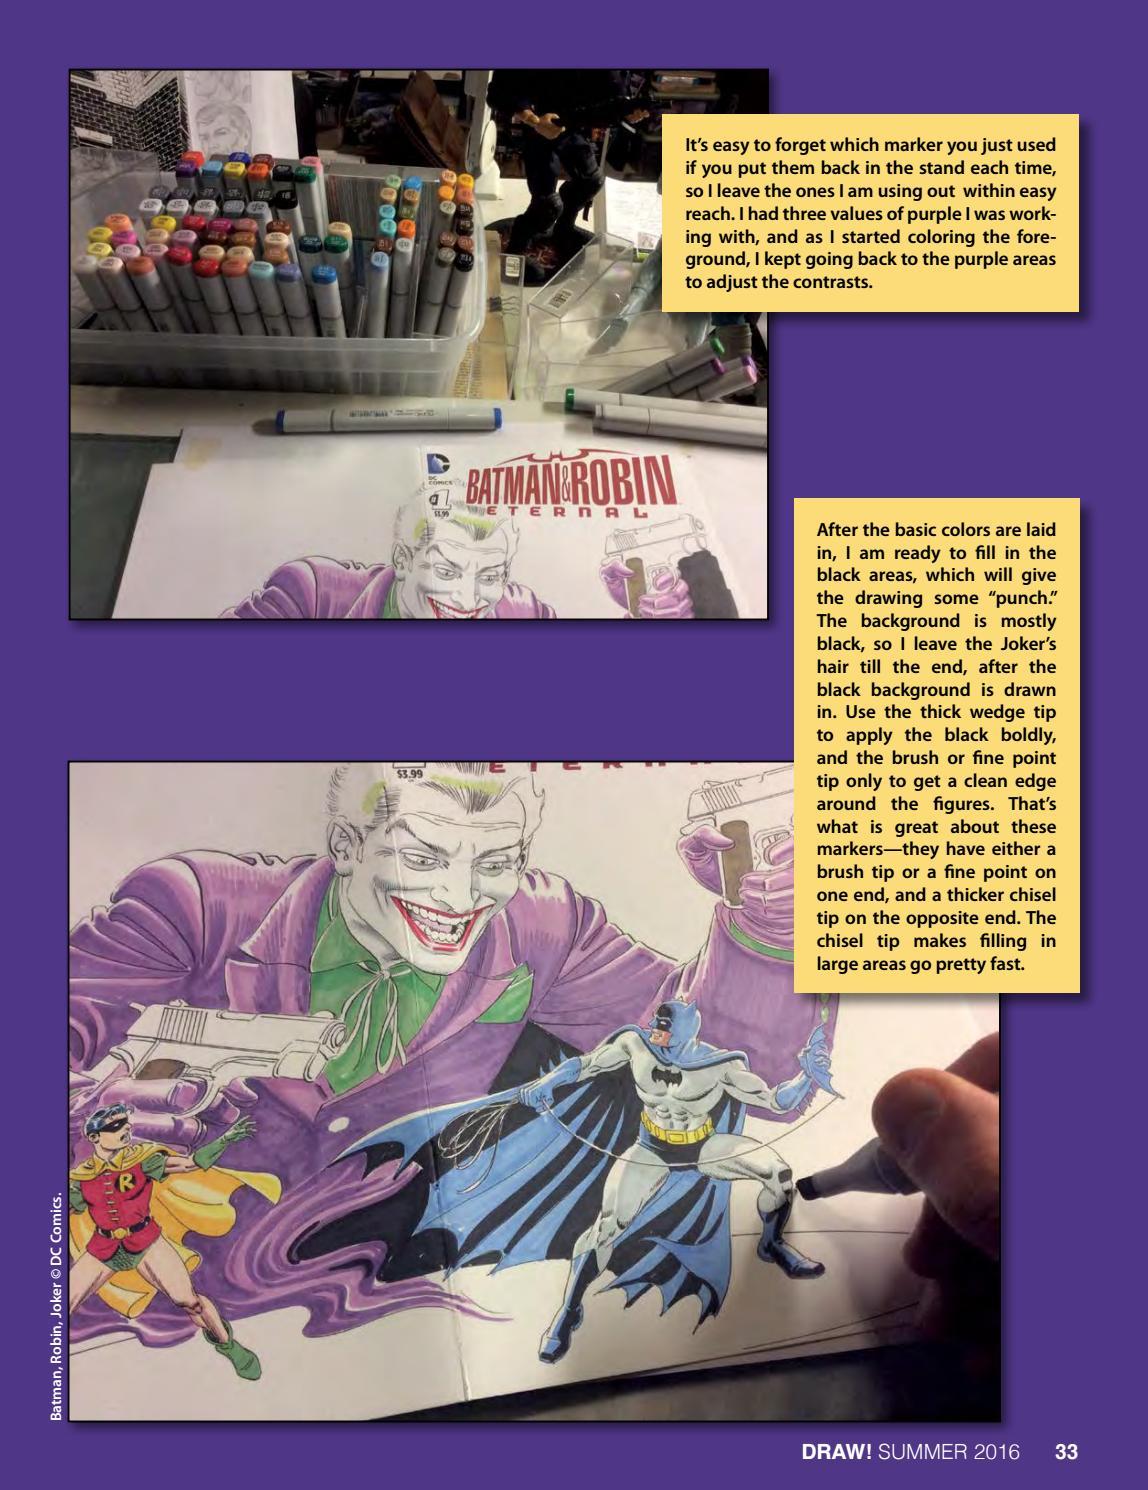 DRAW! Comic Books - #32